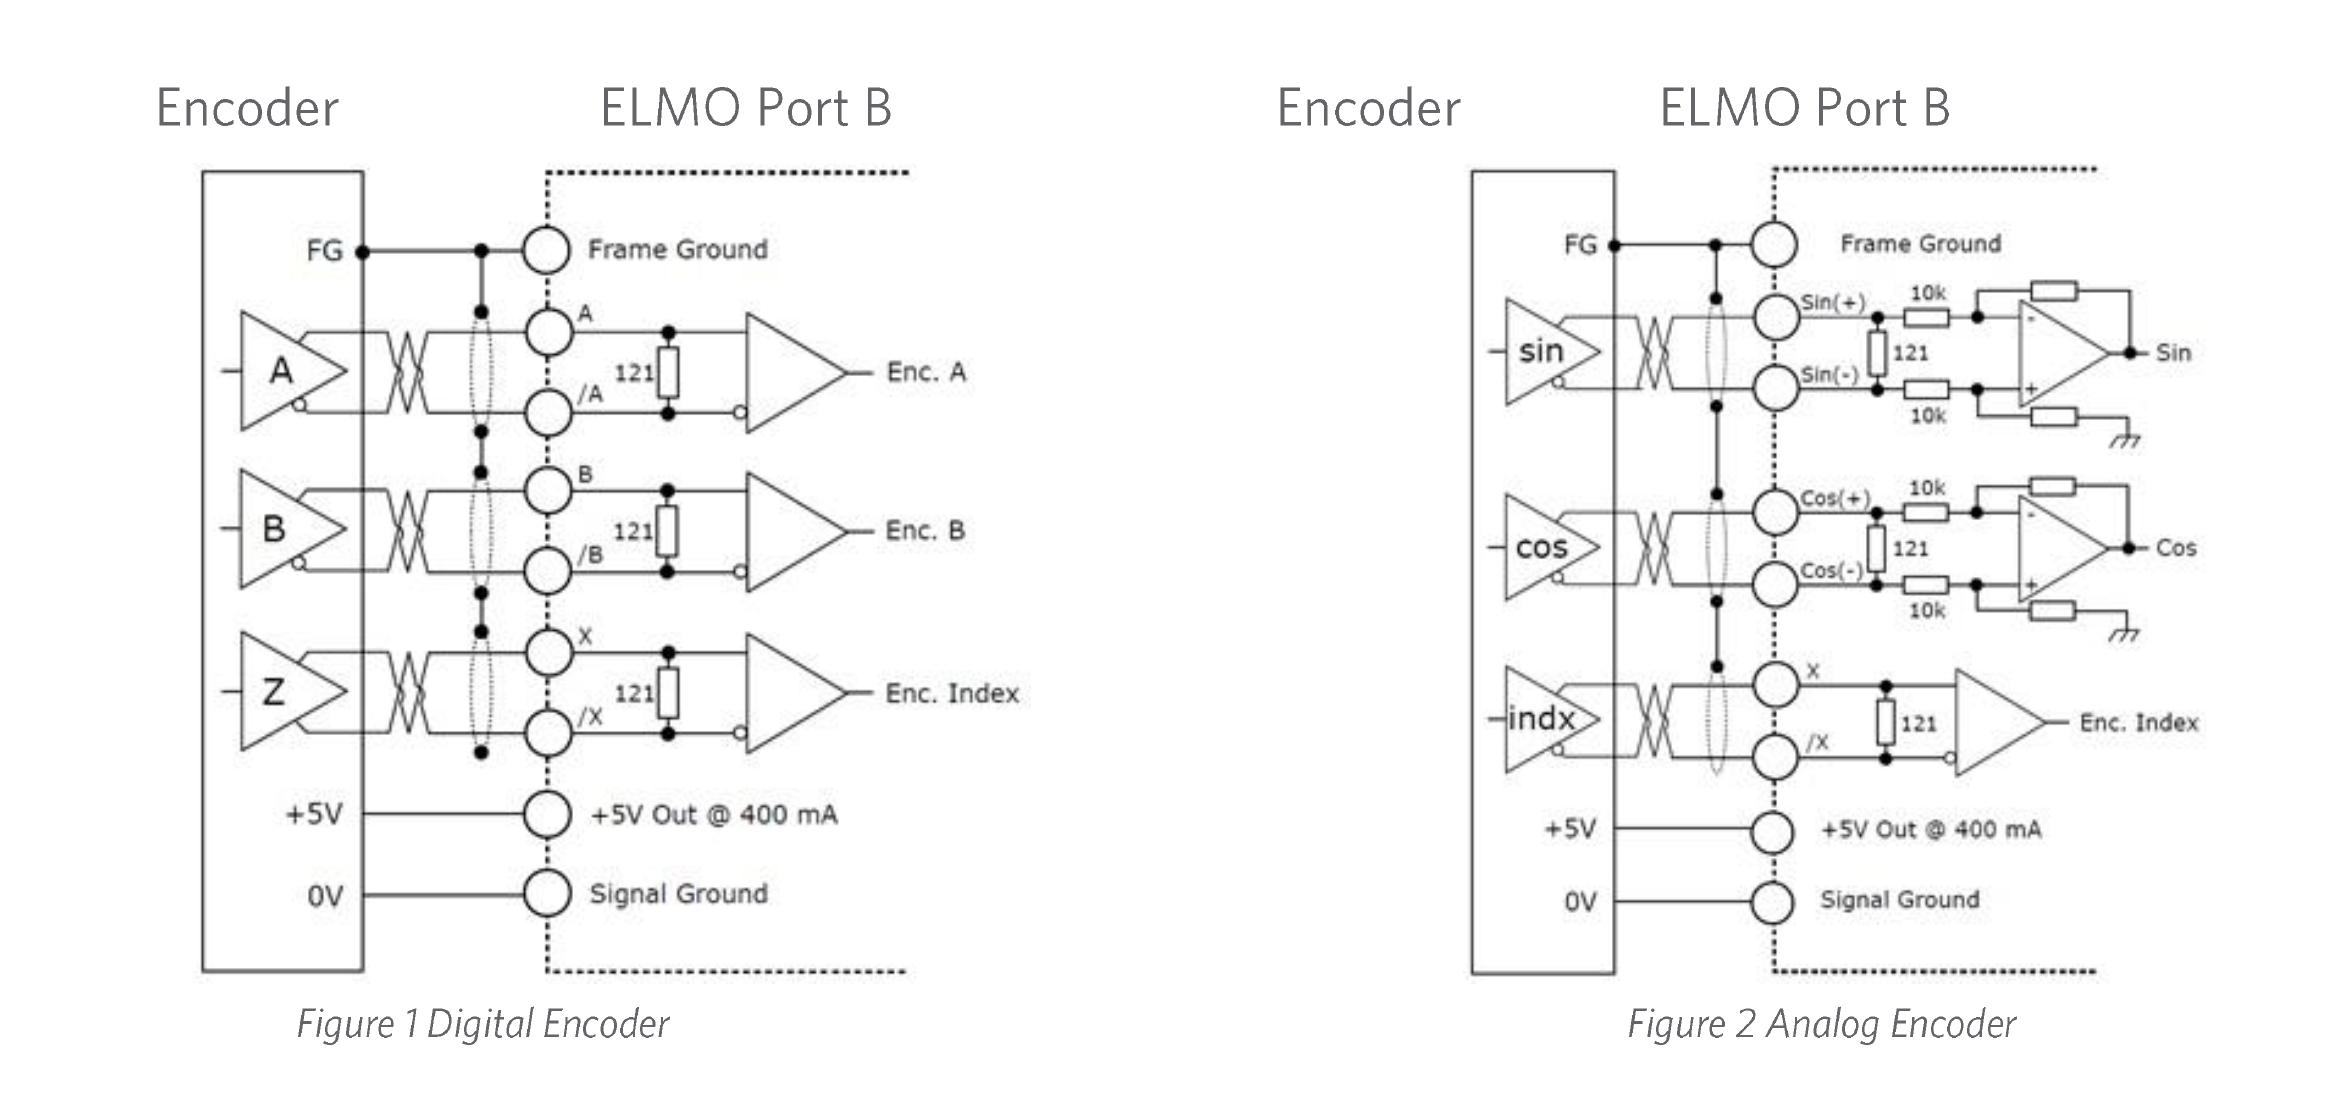 Wire encoder-to-drive connector - Port B - Digital & Analog Encoder